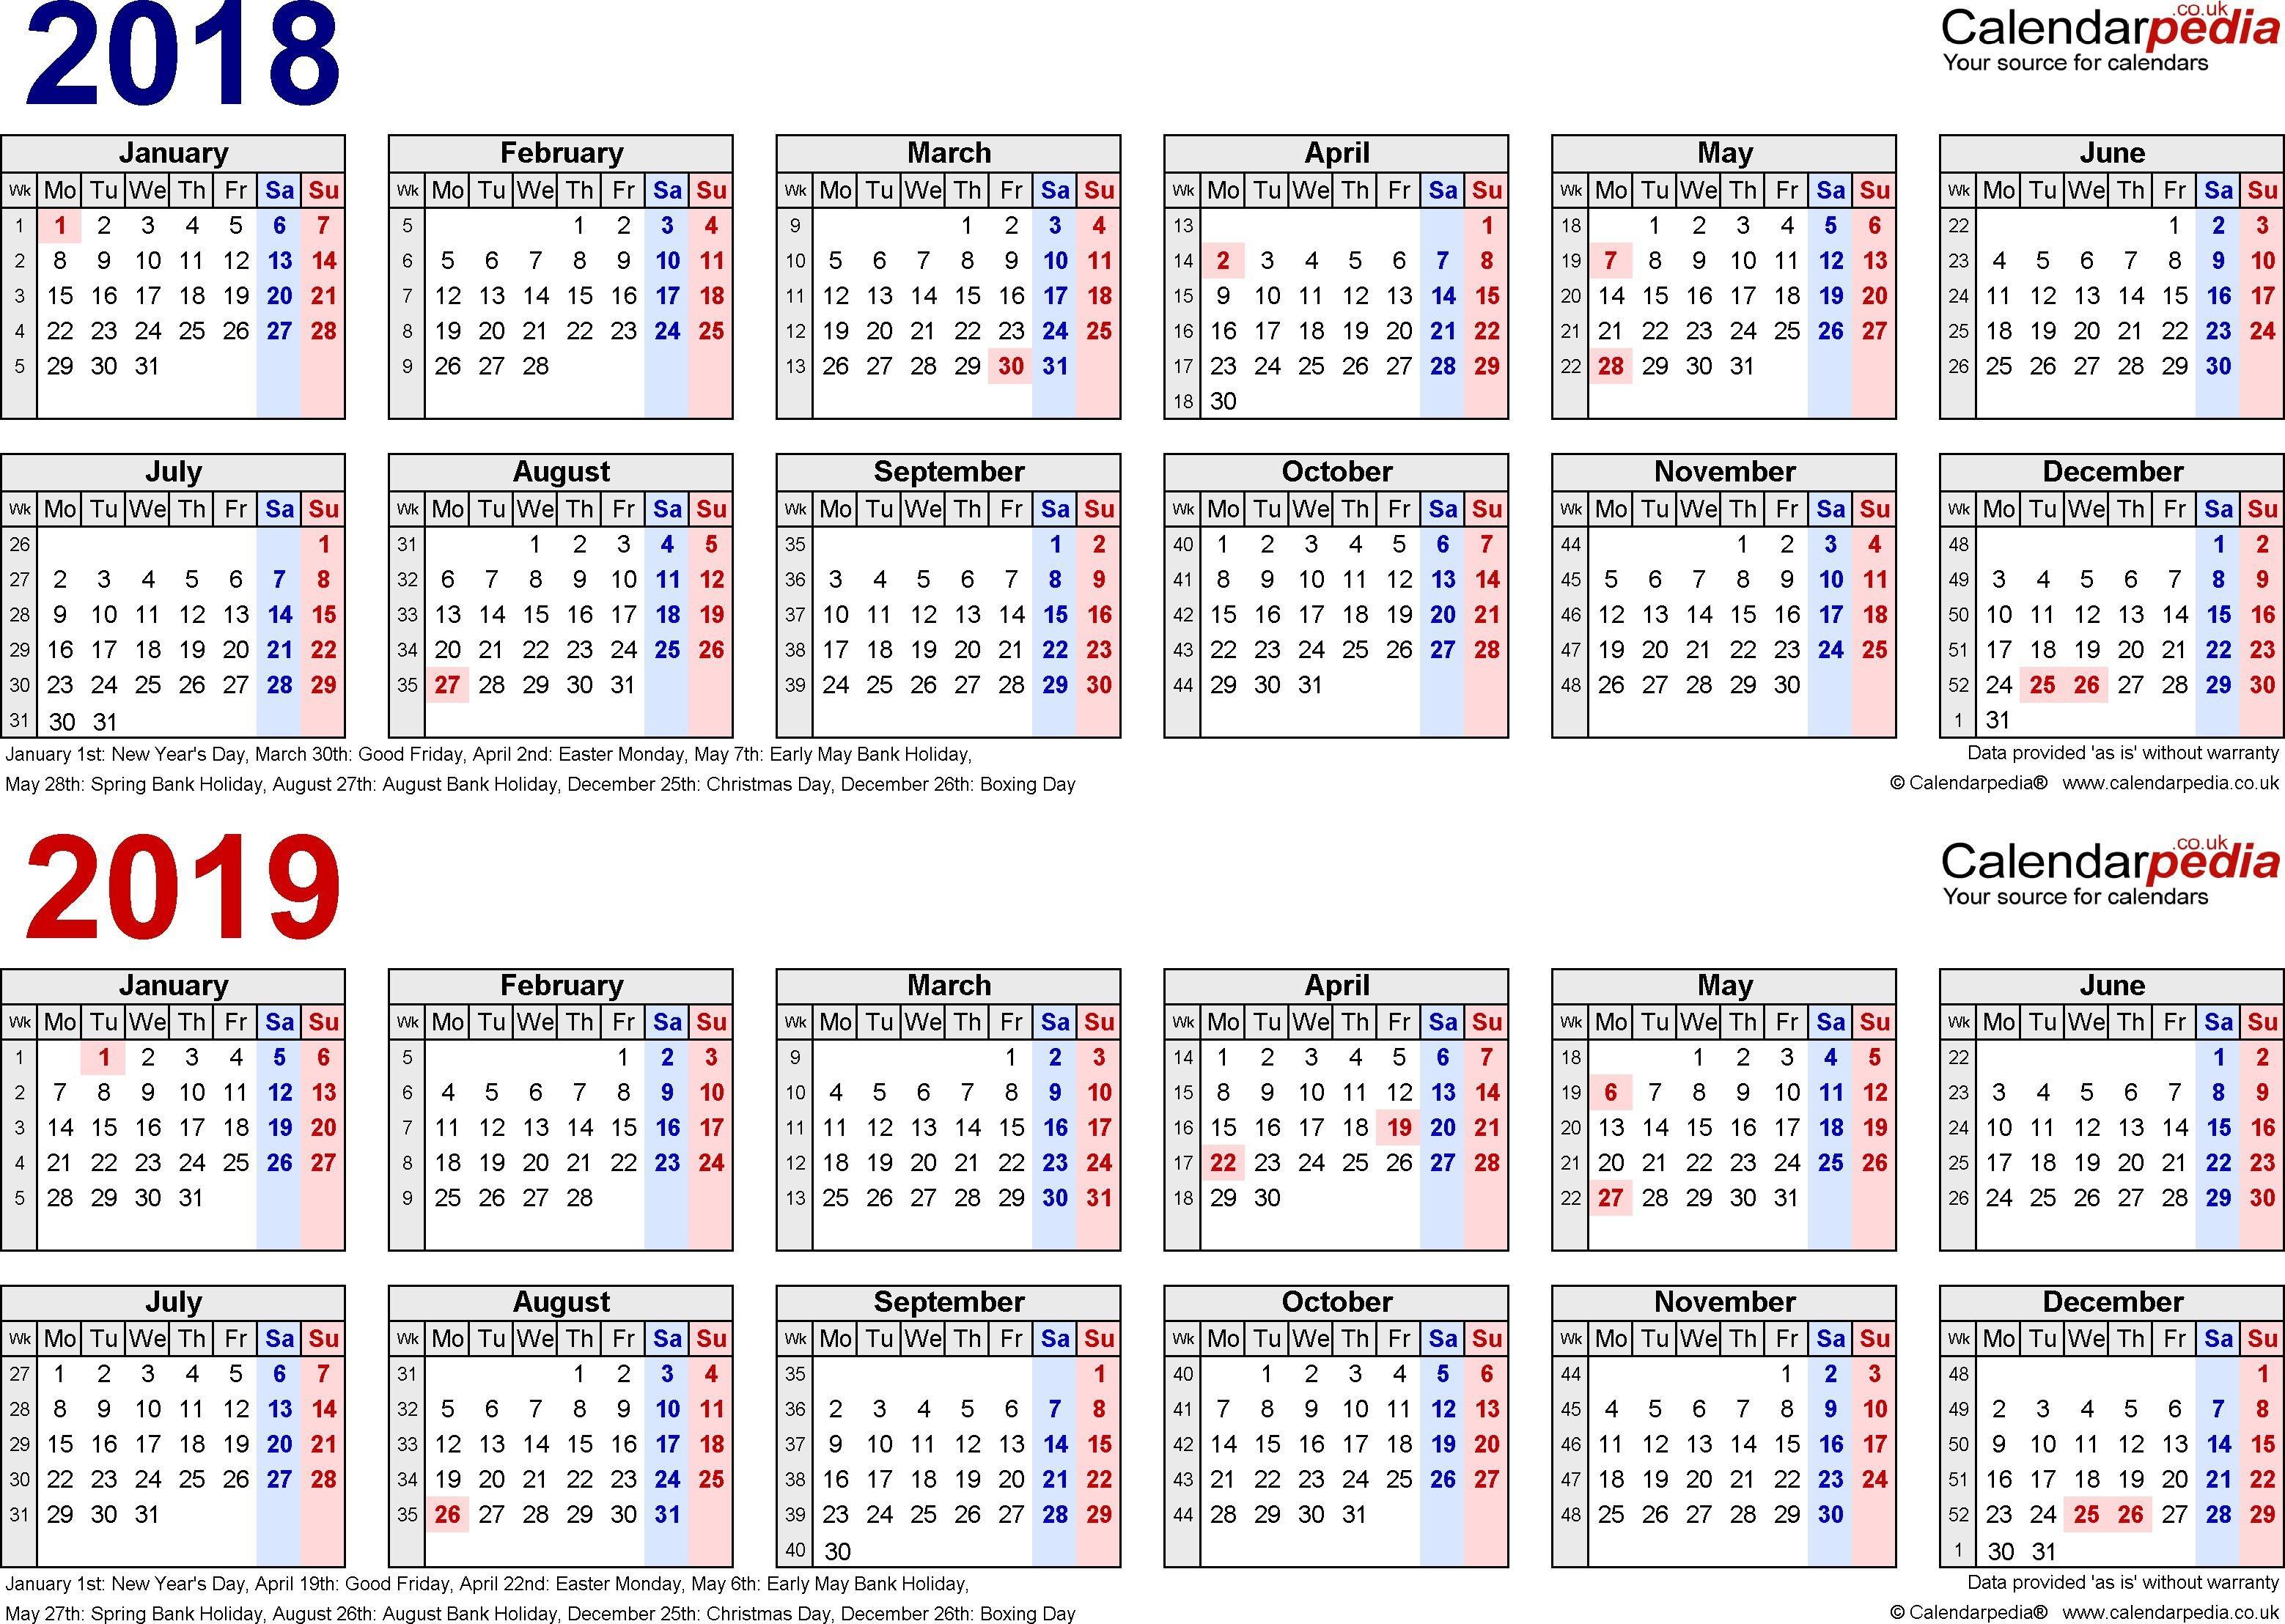 Biweekly Payroll Calendar Template 2019